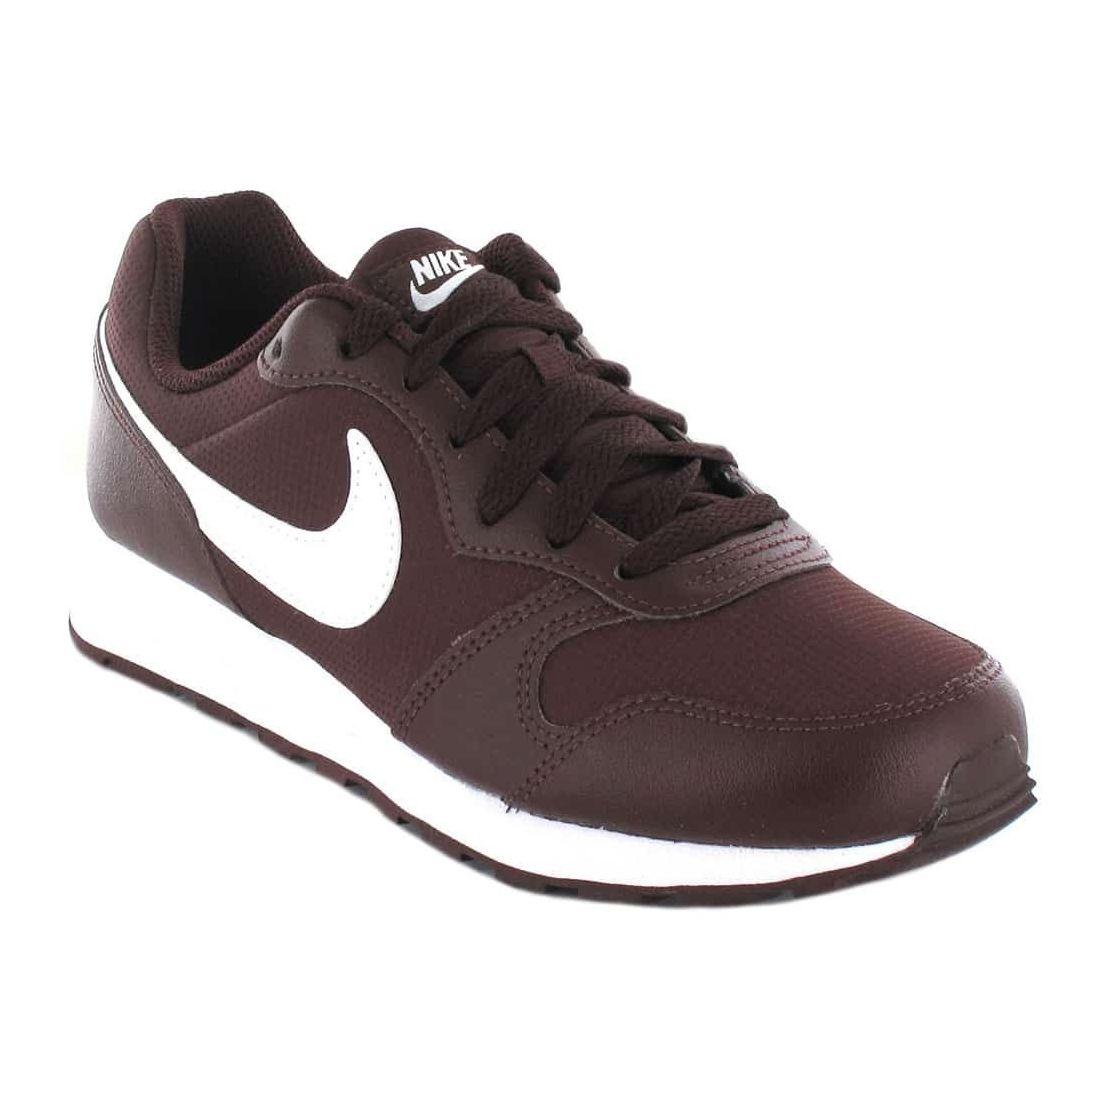 Nike MD Runner 2 PE GS - Calzado Casual Junior